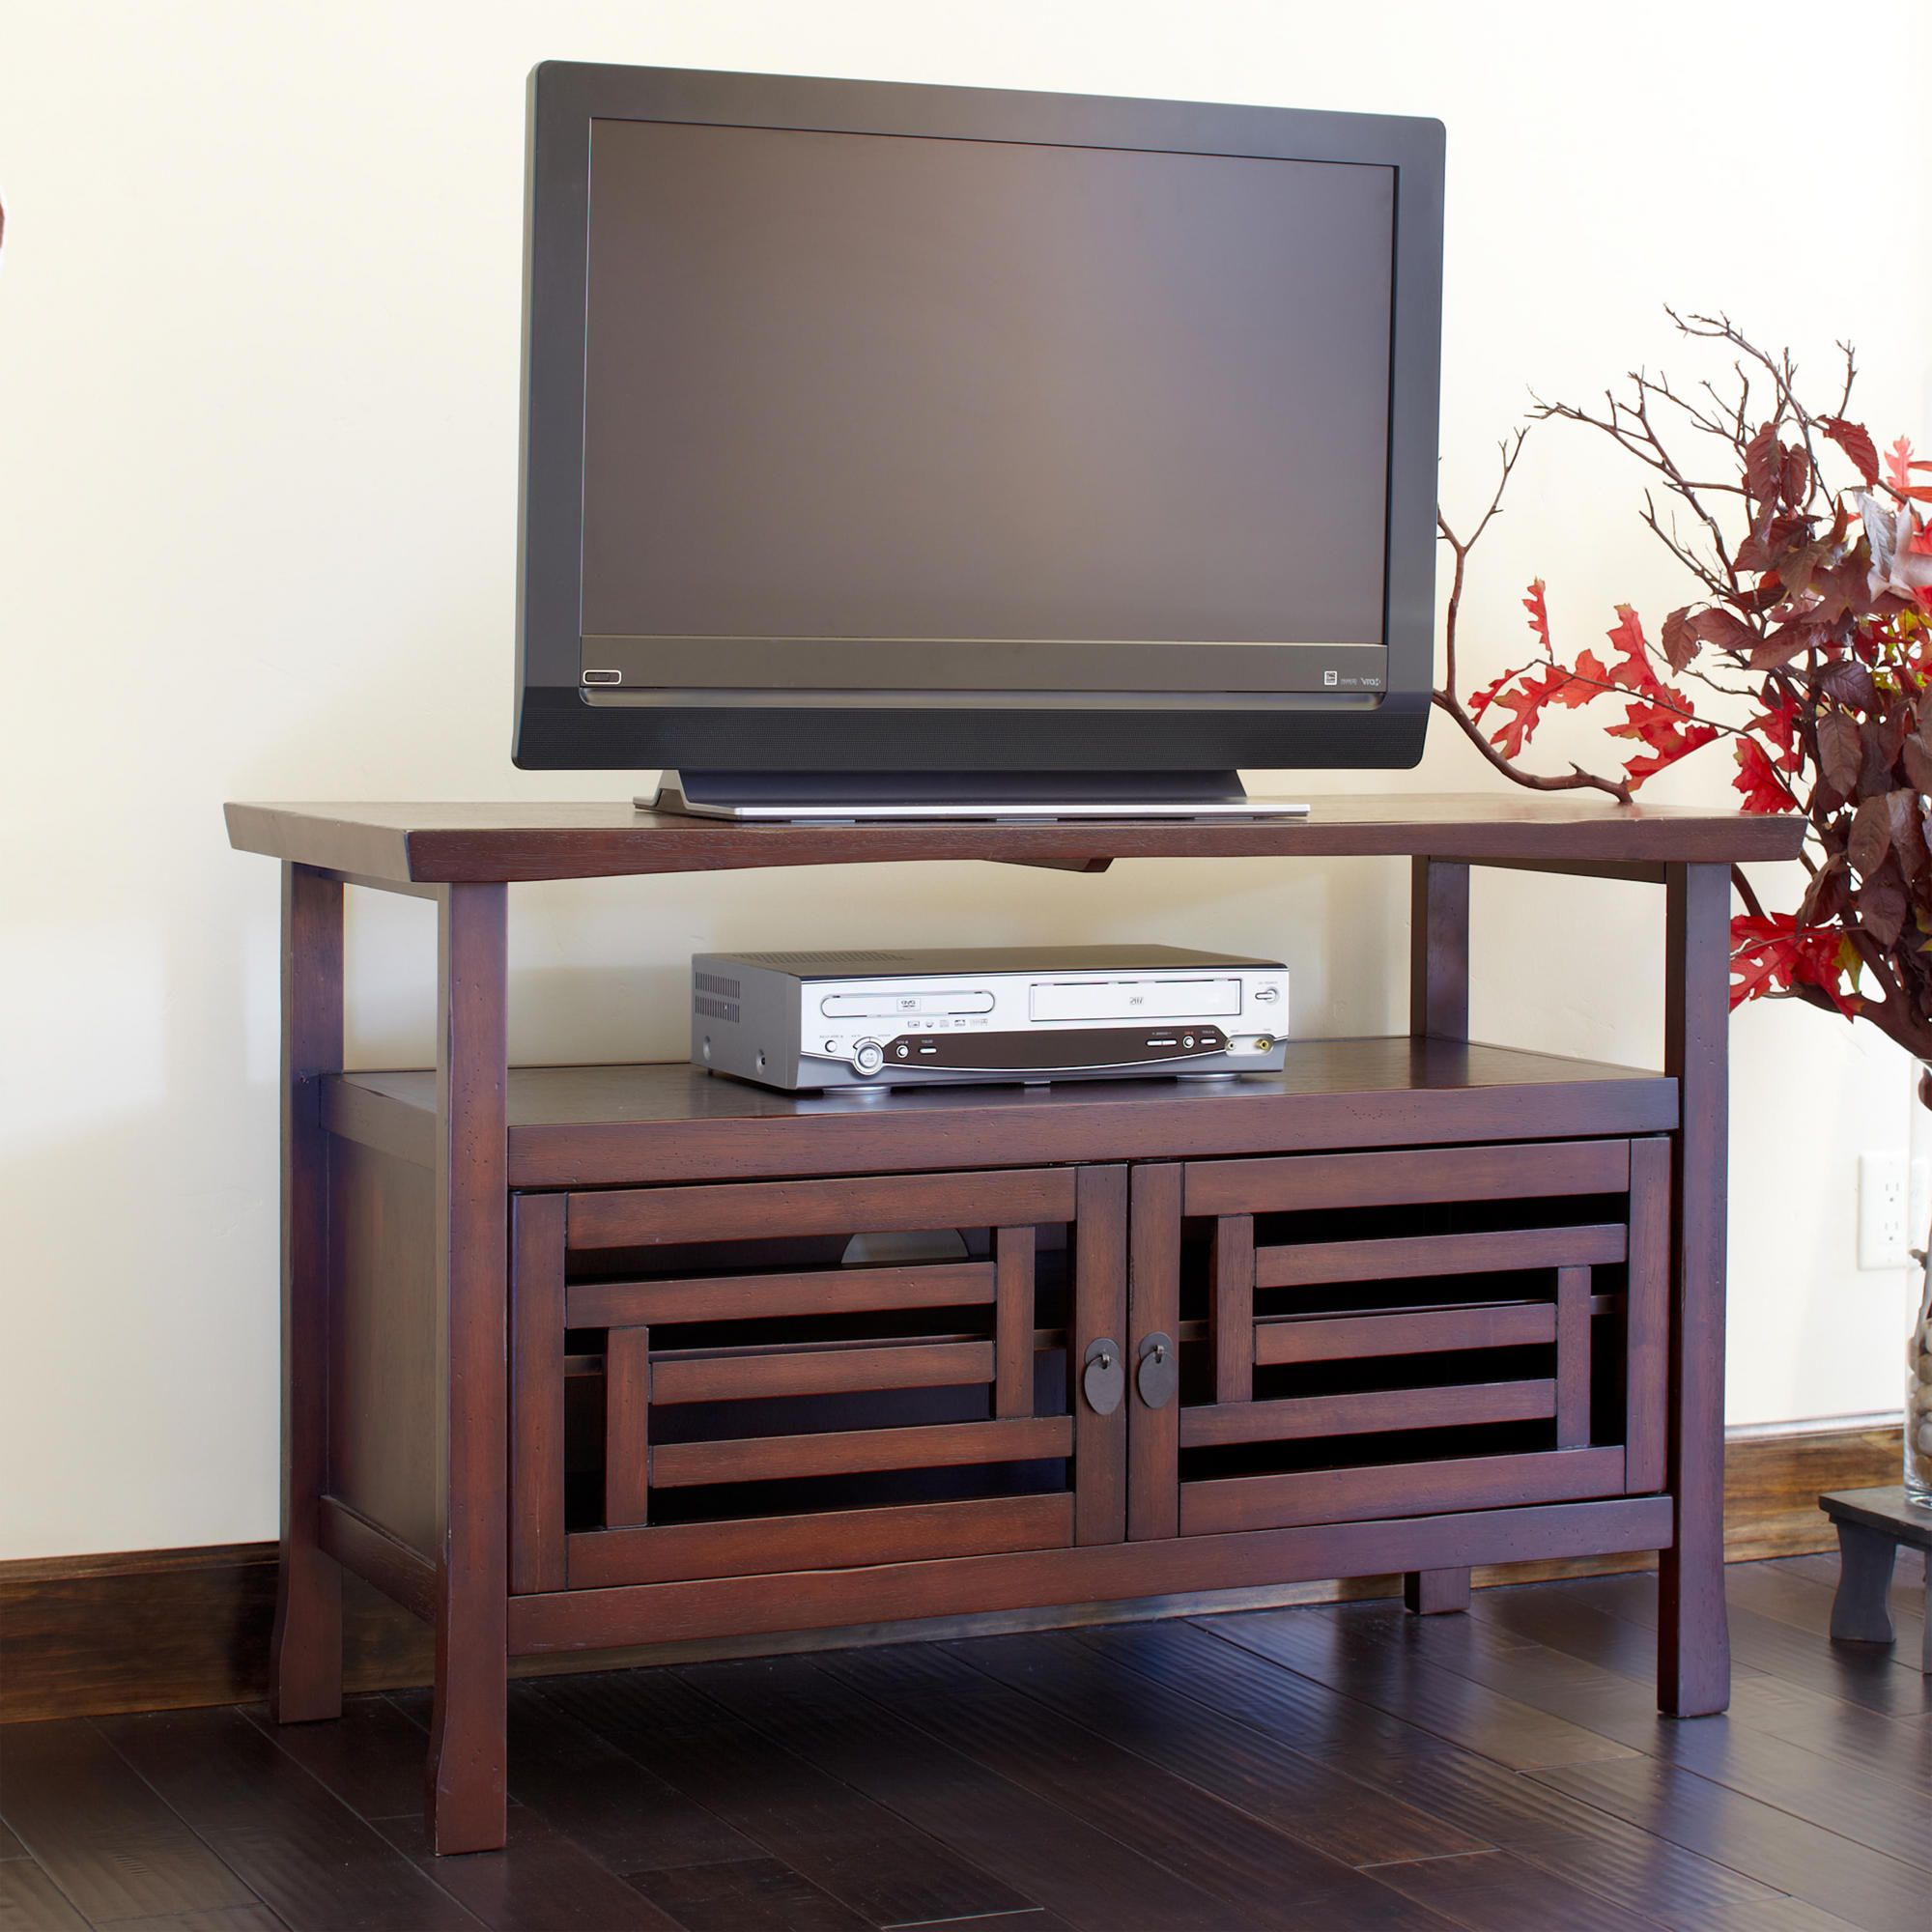 Hako Media Cabinet | World Market | Things I want to adorn my ...